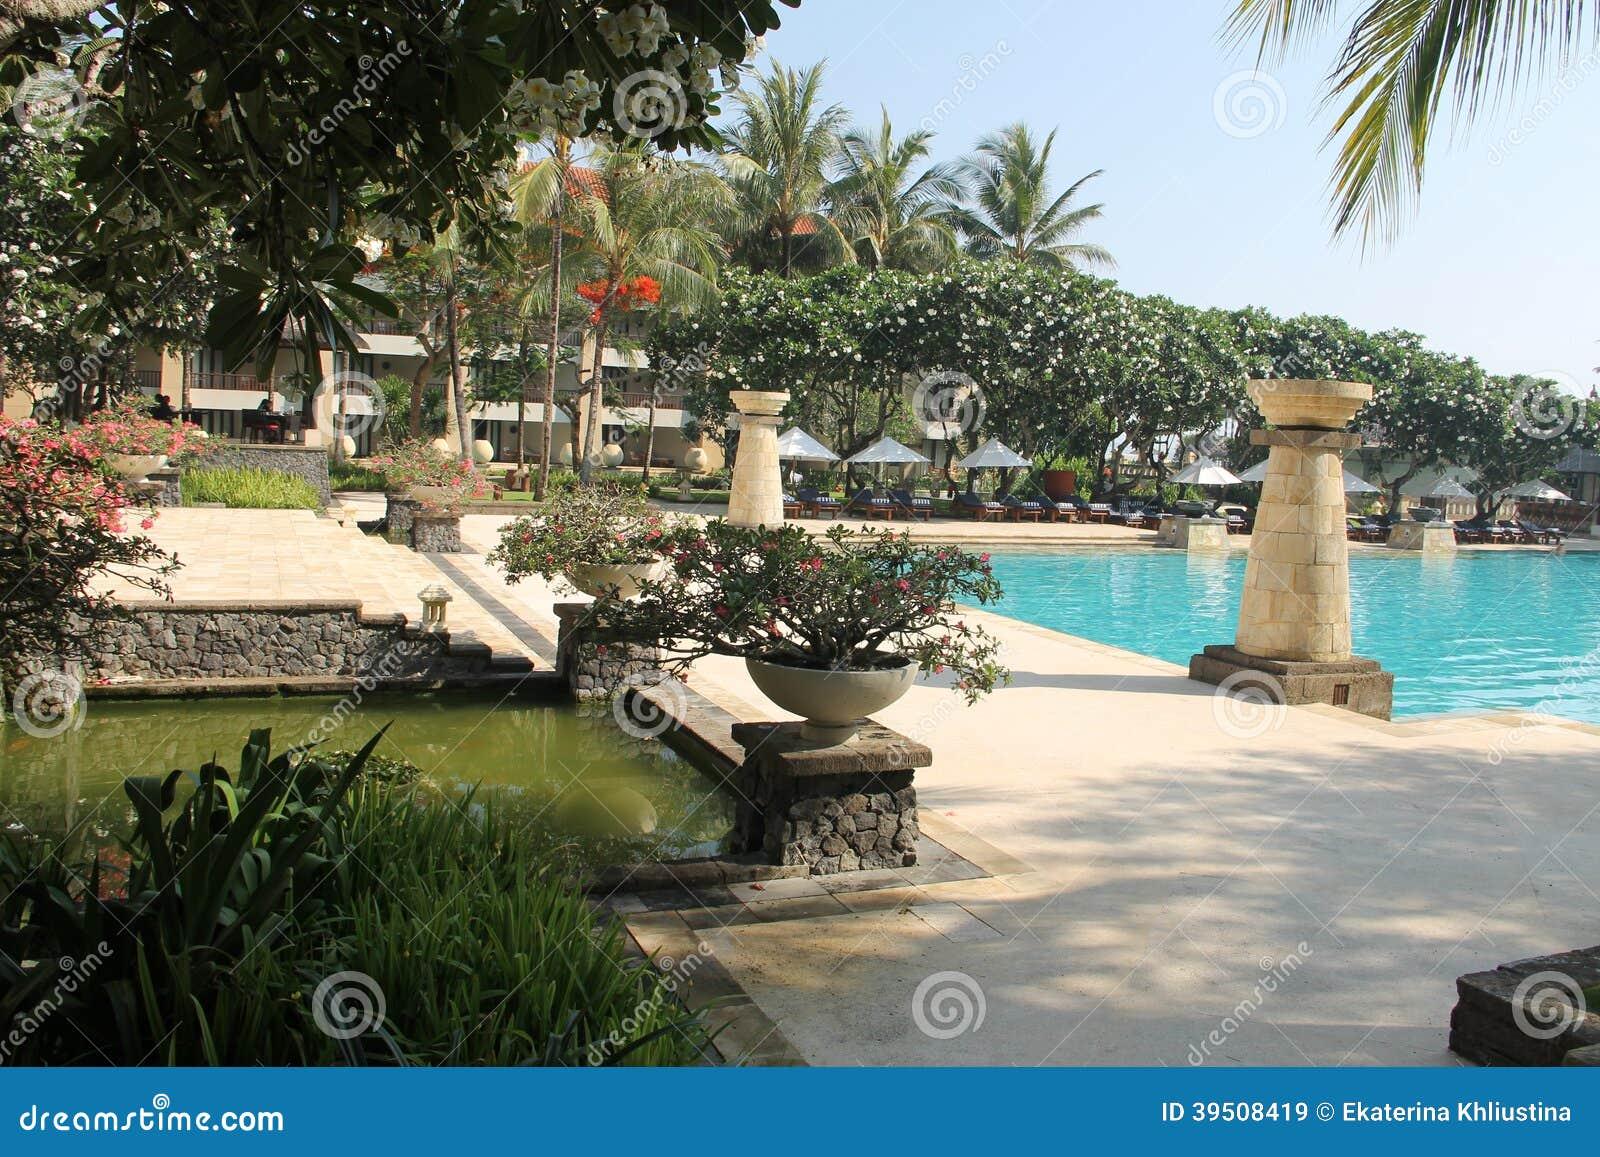 Indonesian holiday on Bali s very nice